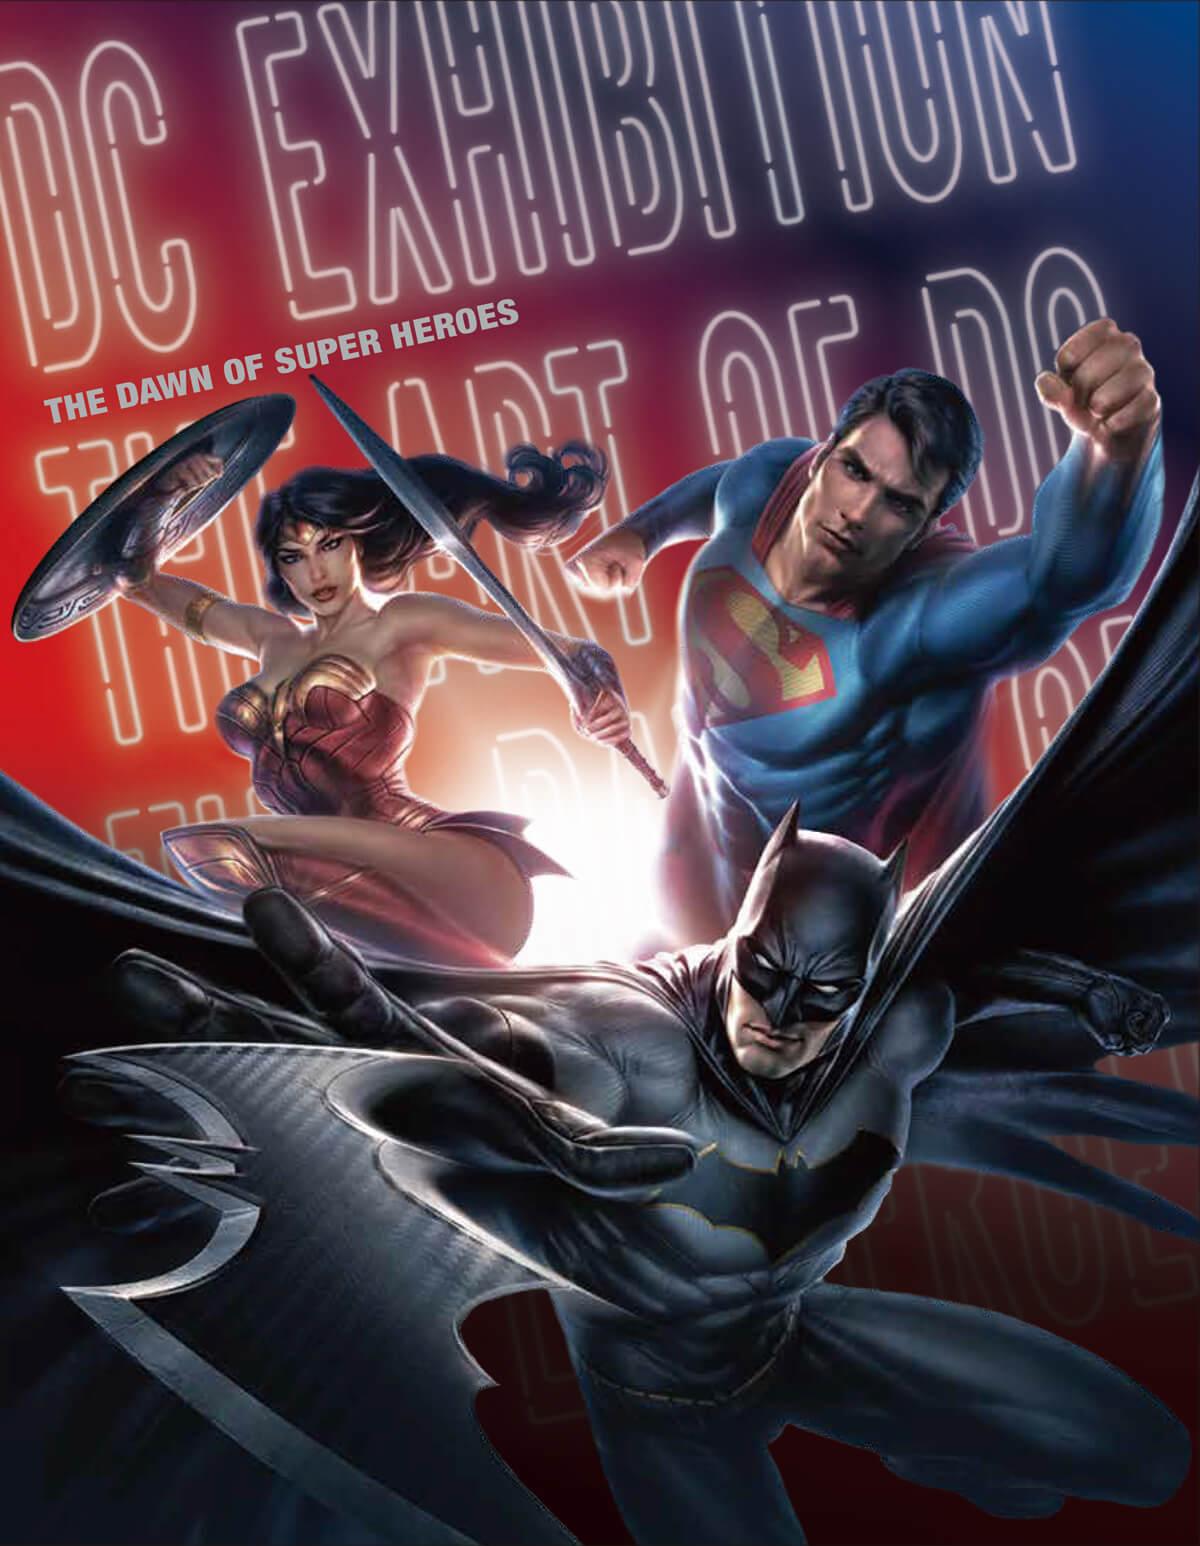 DC展 スーパーヒーローの誕生 in 東京・六本木 6月25日より開催!